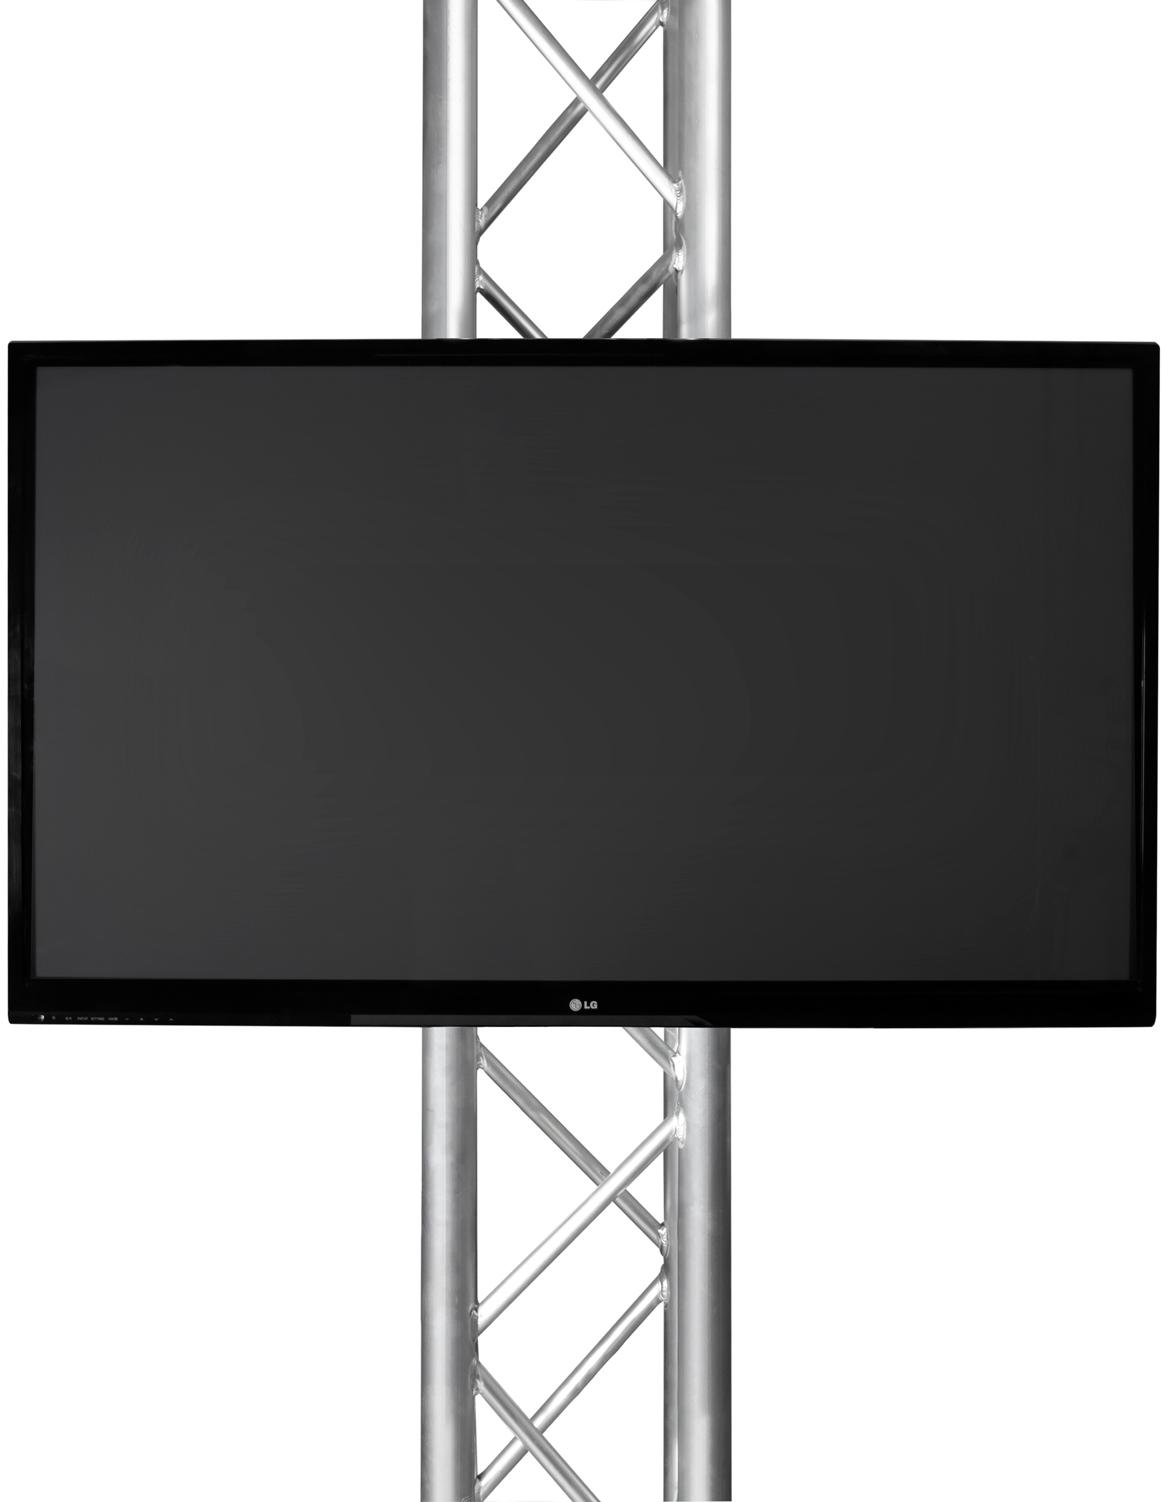 riggatec led lcd tv traversenhalterung 42 100 f r fd 31 hd 44 st 54 g nstig bei ltt